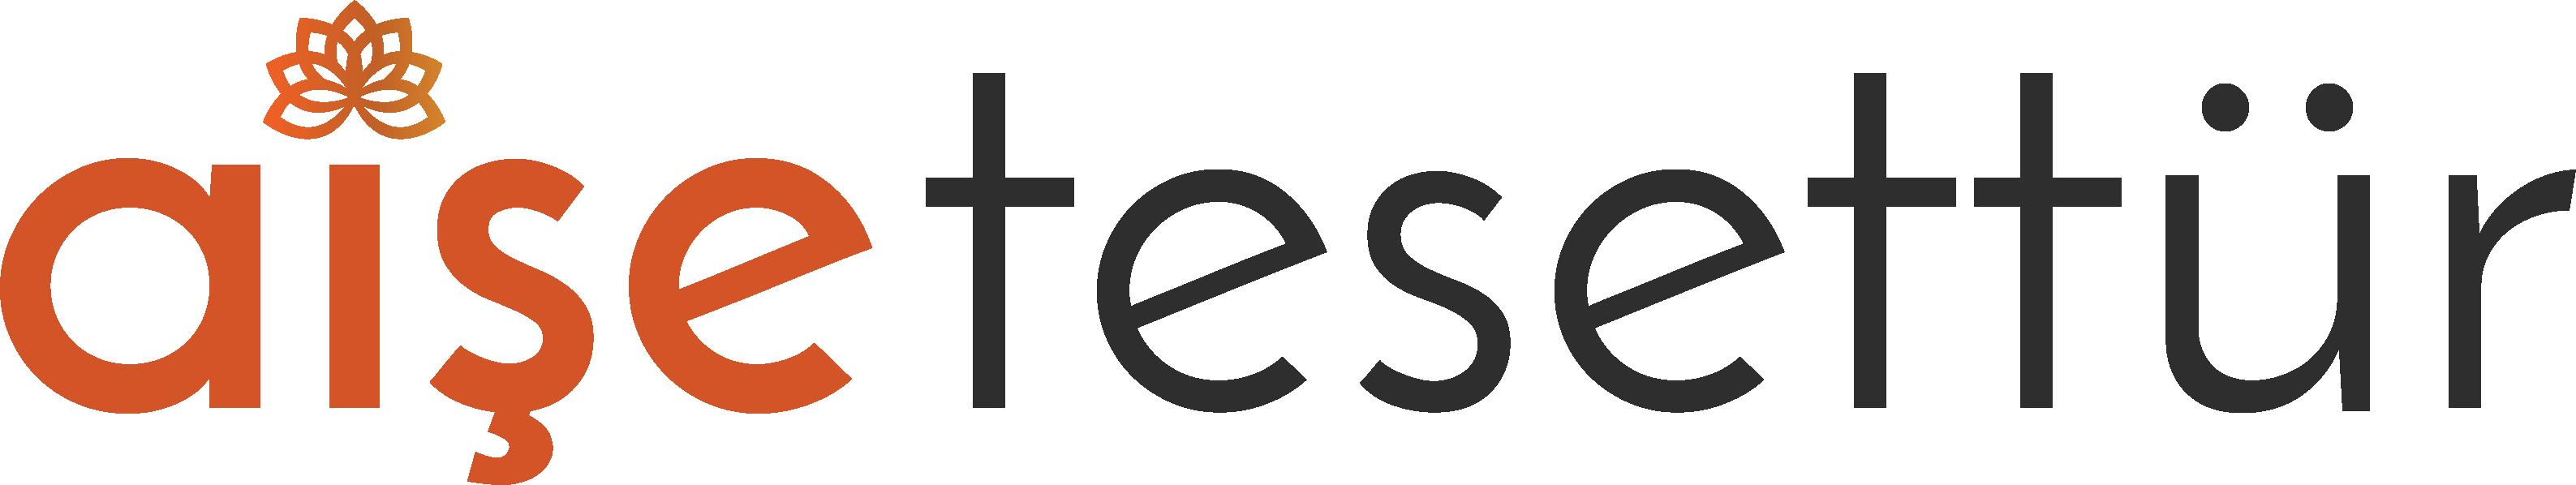 logo.png (57 KB)